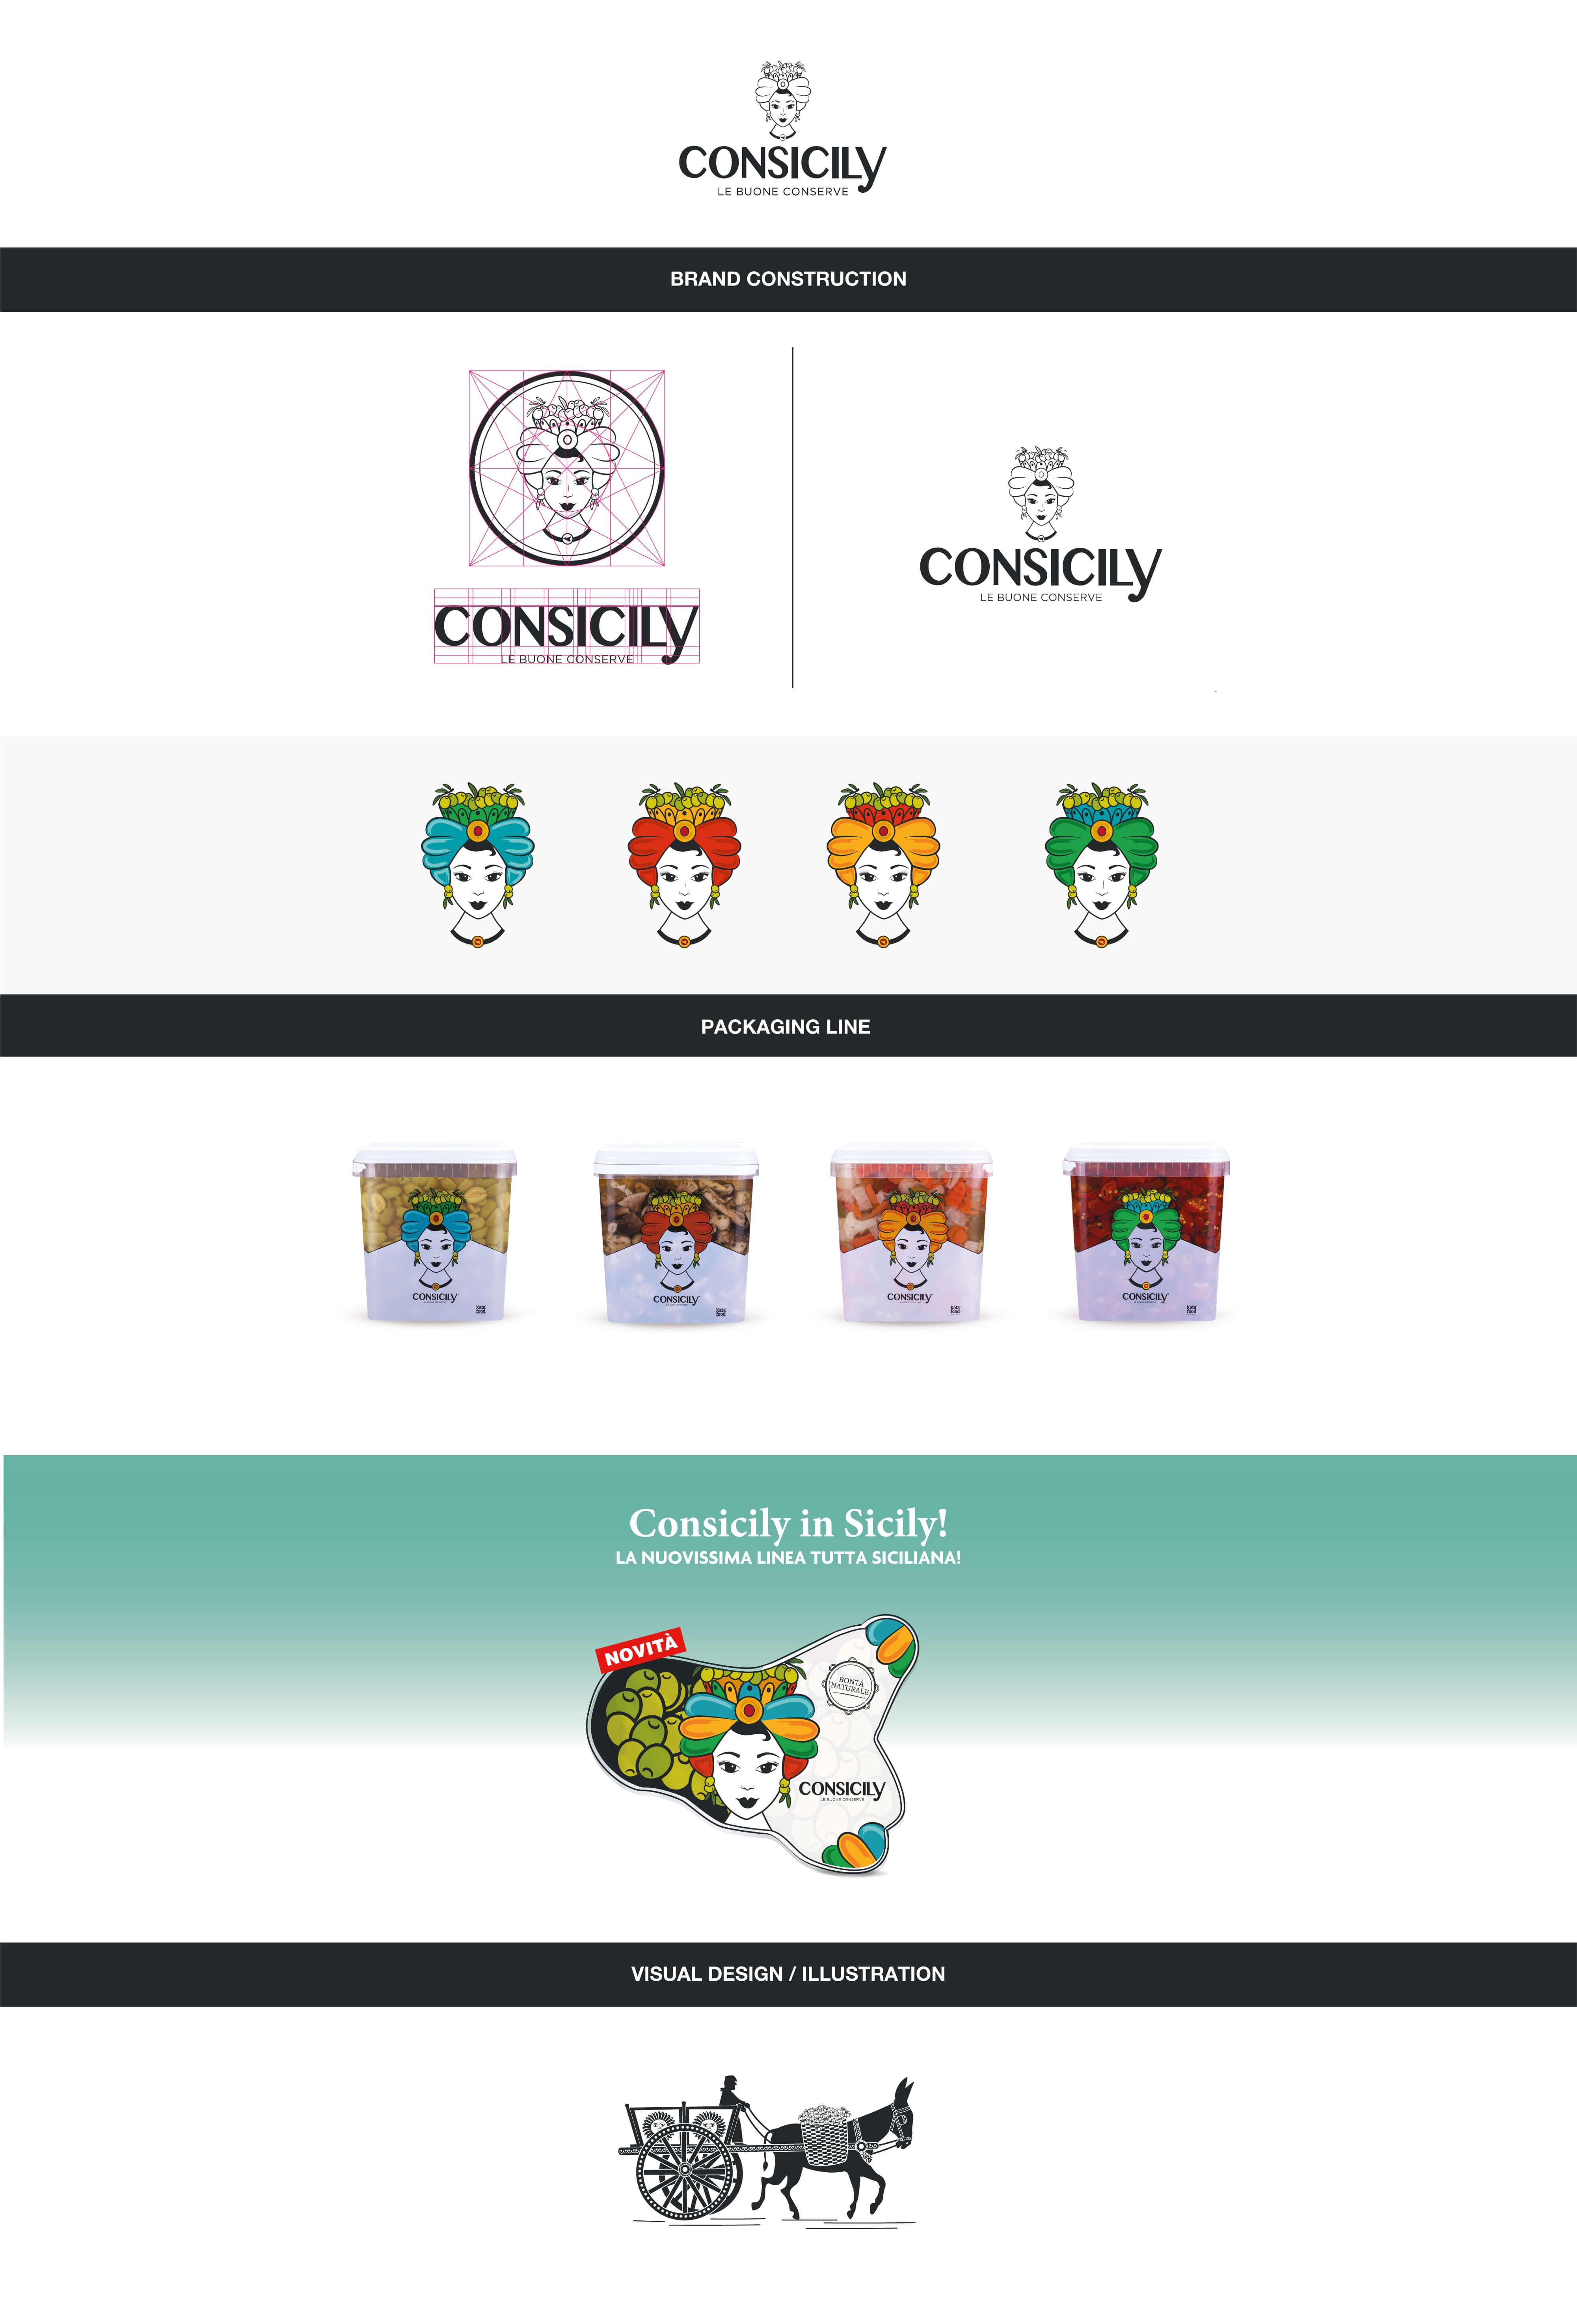 consicily-01